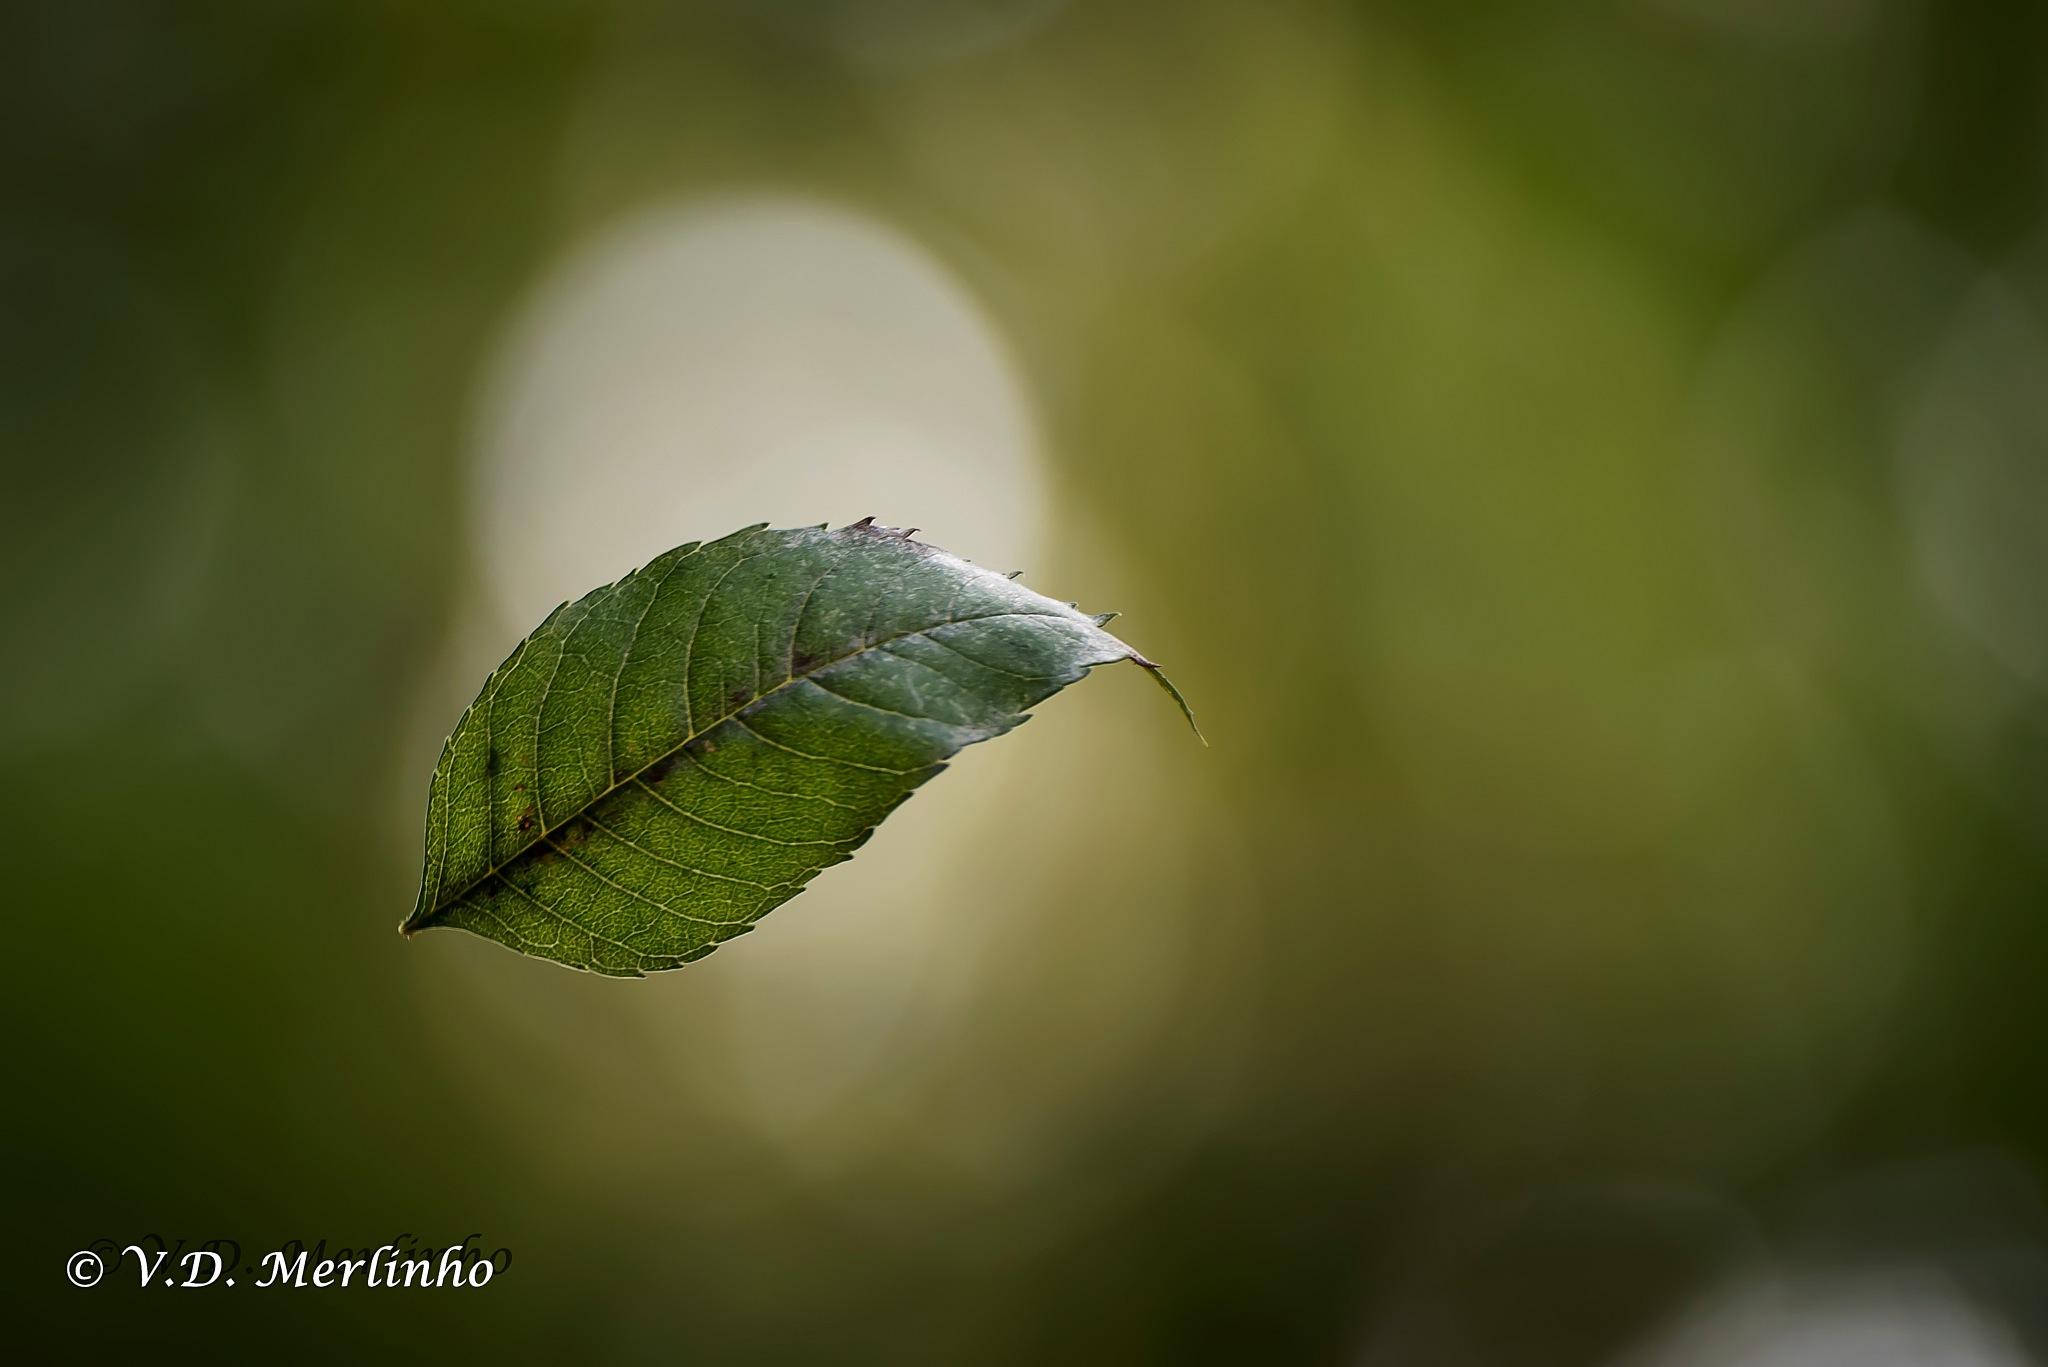 Larga la foglia stretta la via-Stay away the narrow leafy stree by merlinho